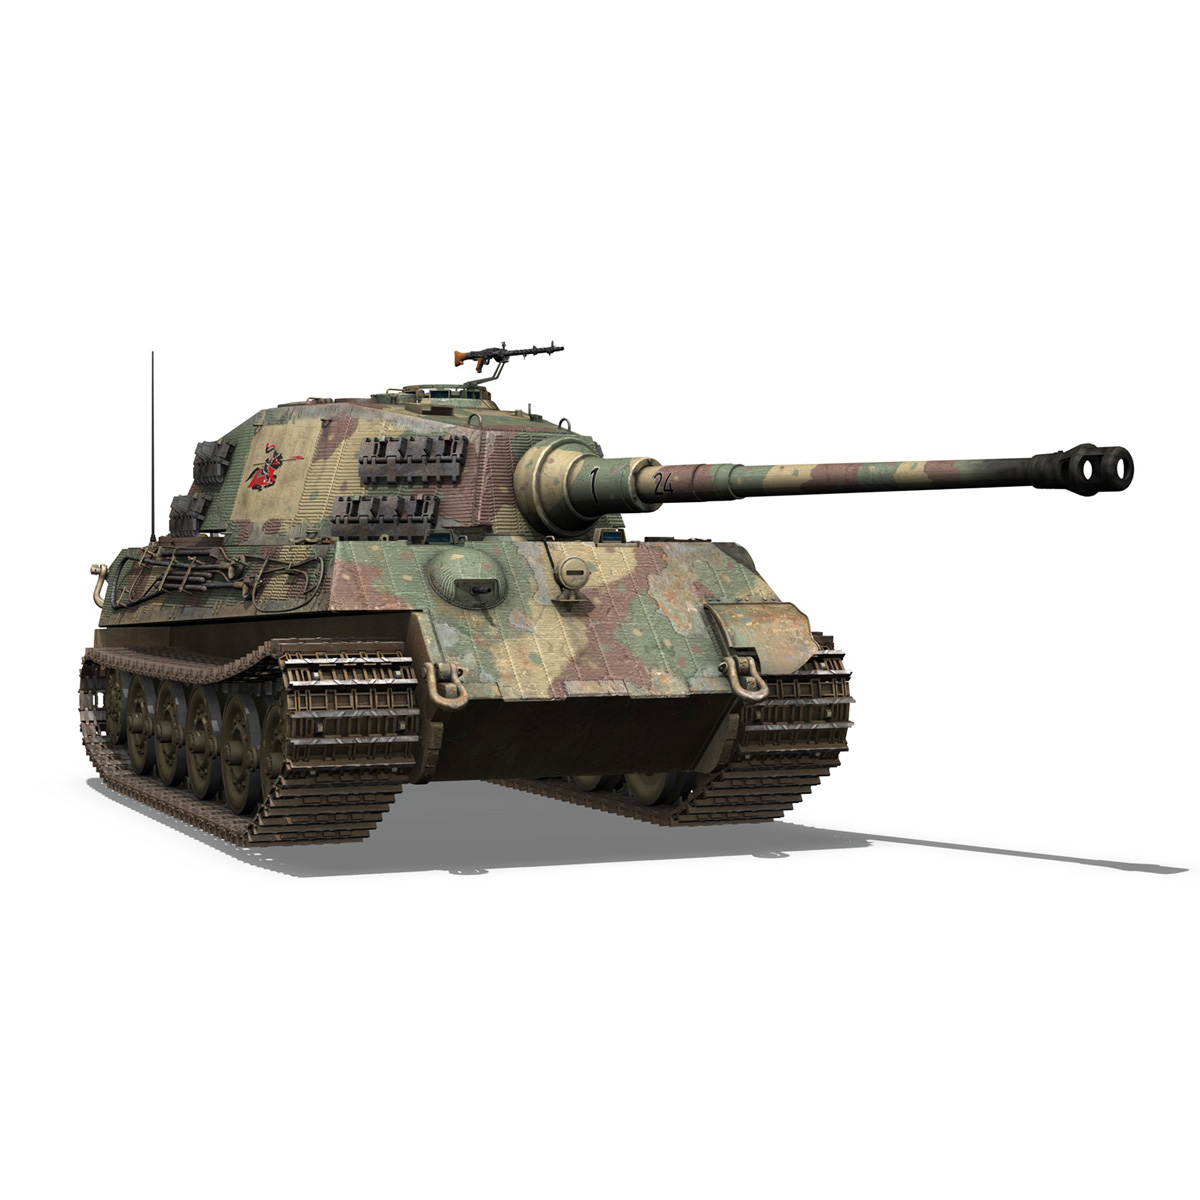 Panzerkampfwagen VI - Ausf B - Tiger II - 124 3d model 3ds c4d lwo lws lw obj 273761